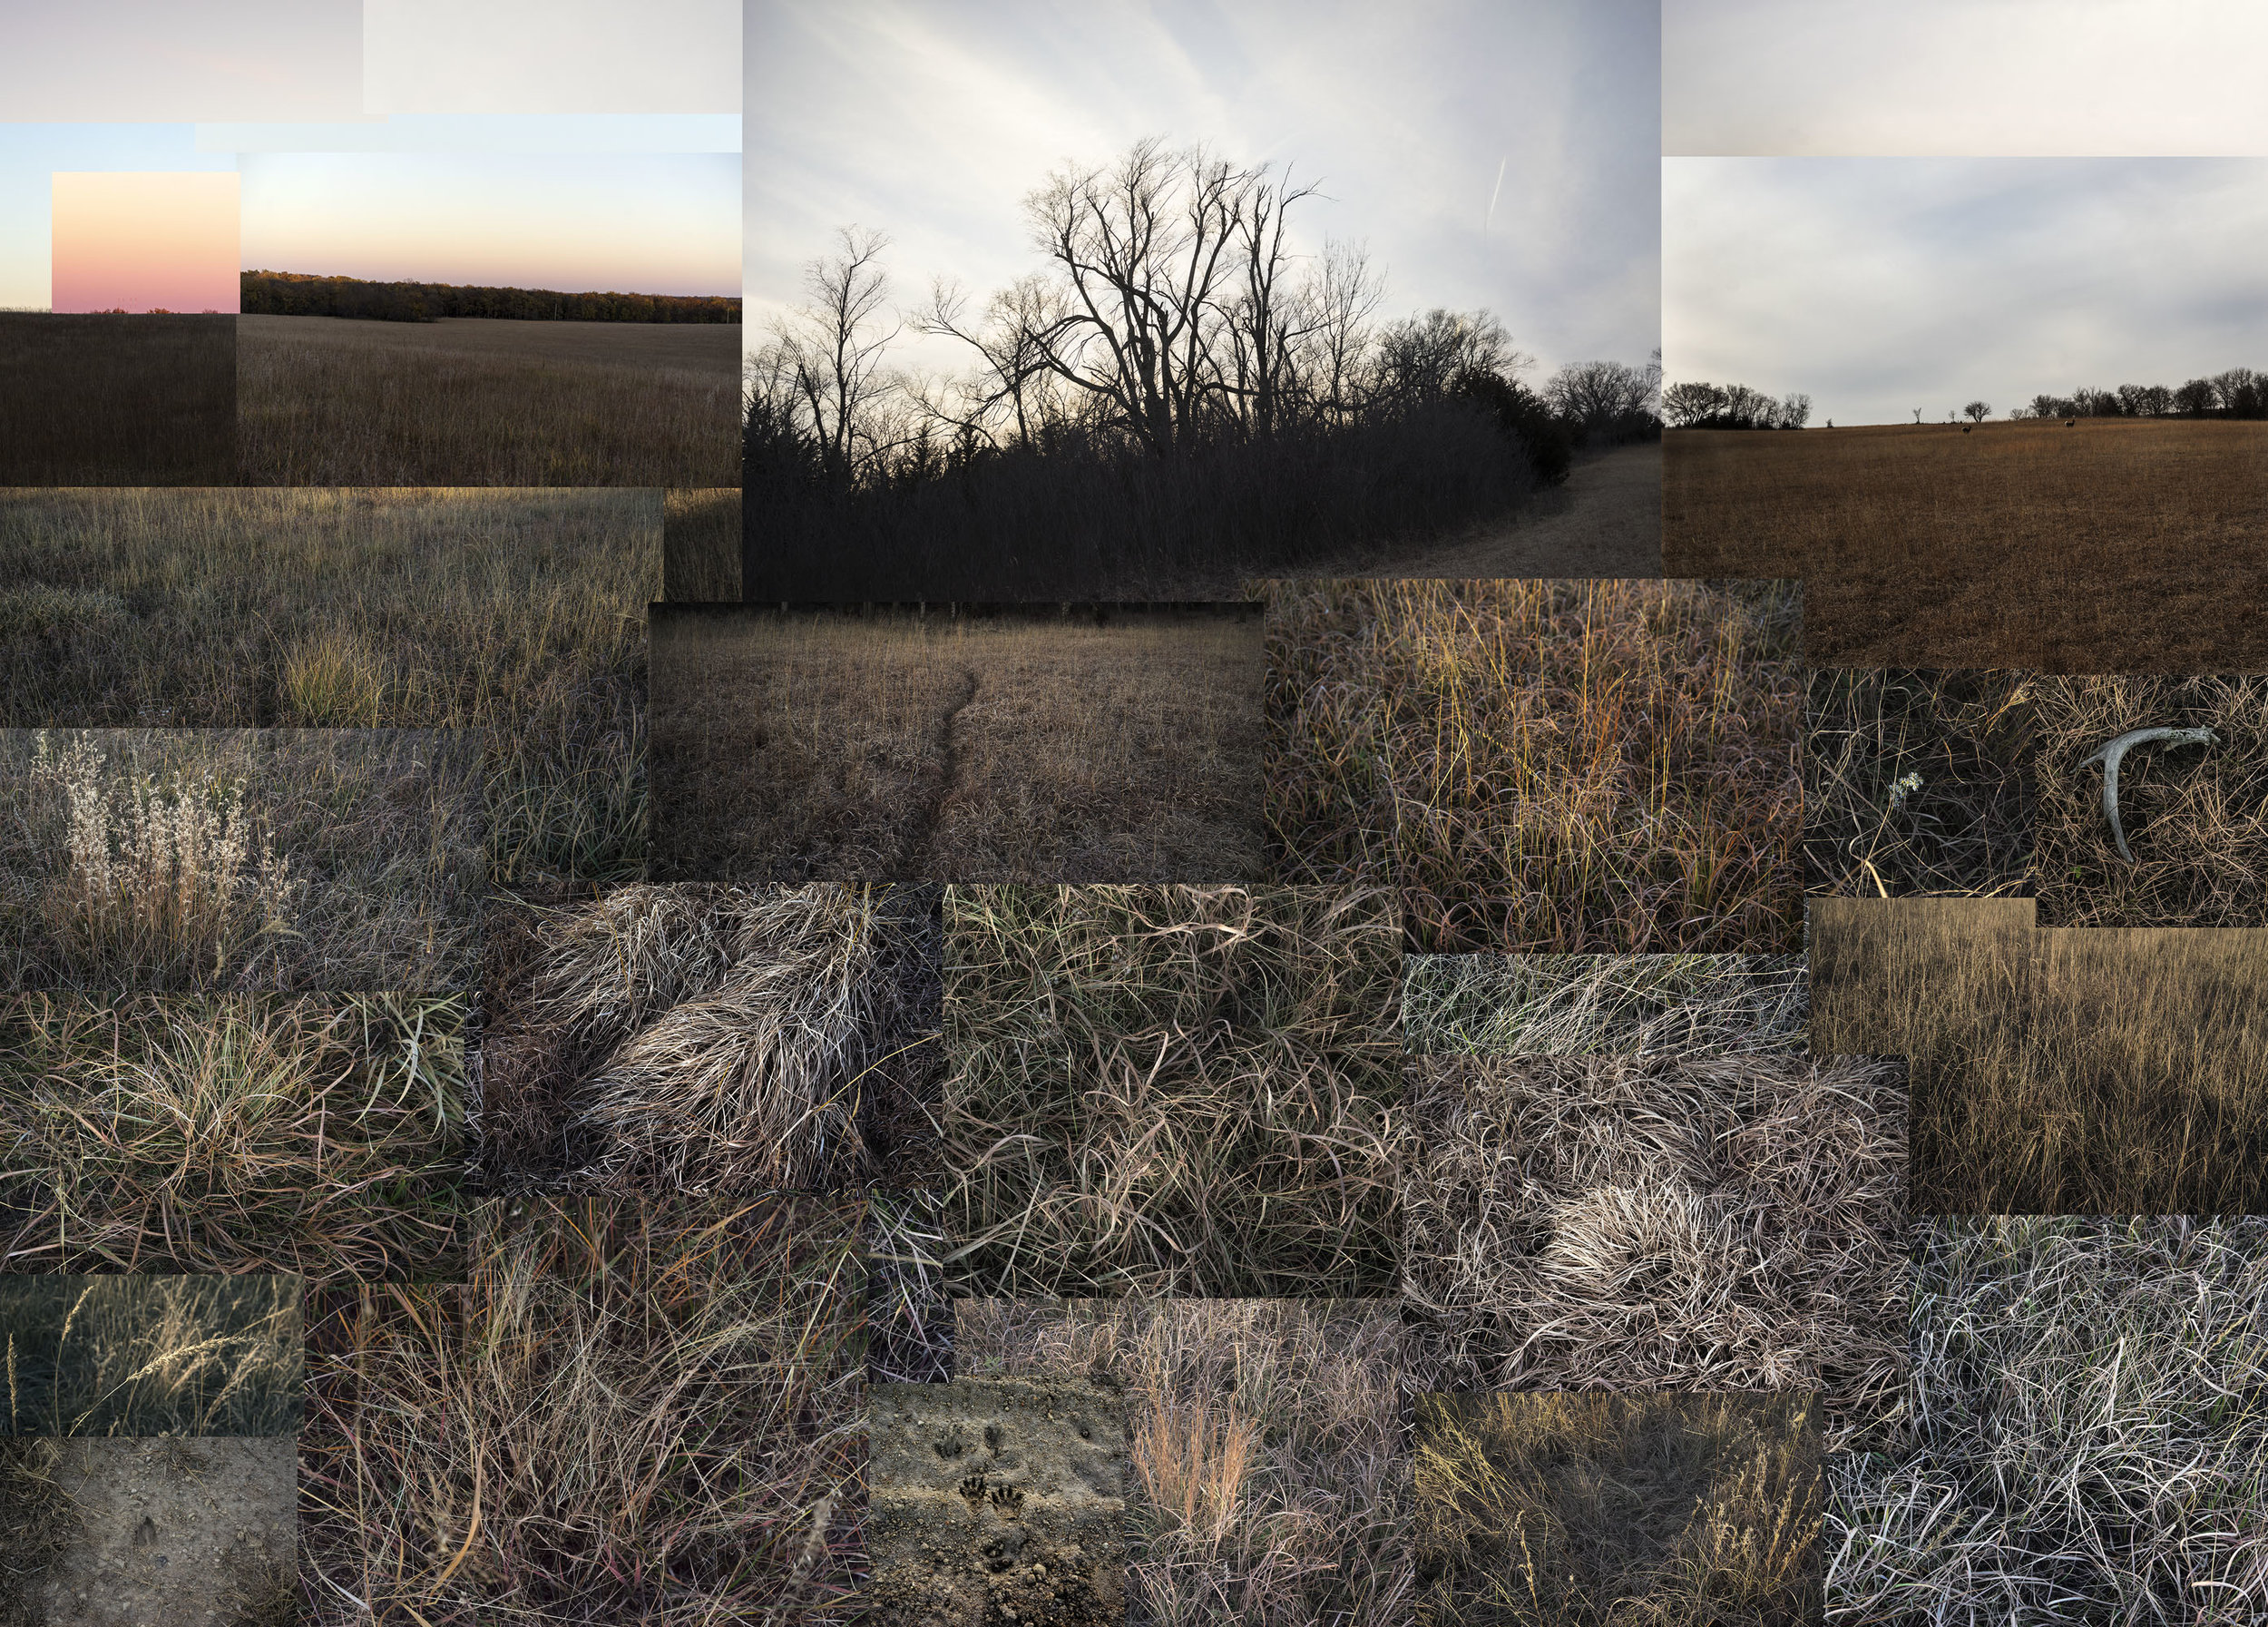 terry.evans-Fent Prairie Janury 2019.jpg